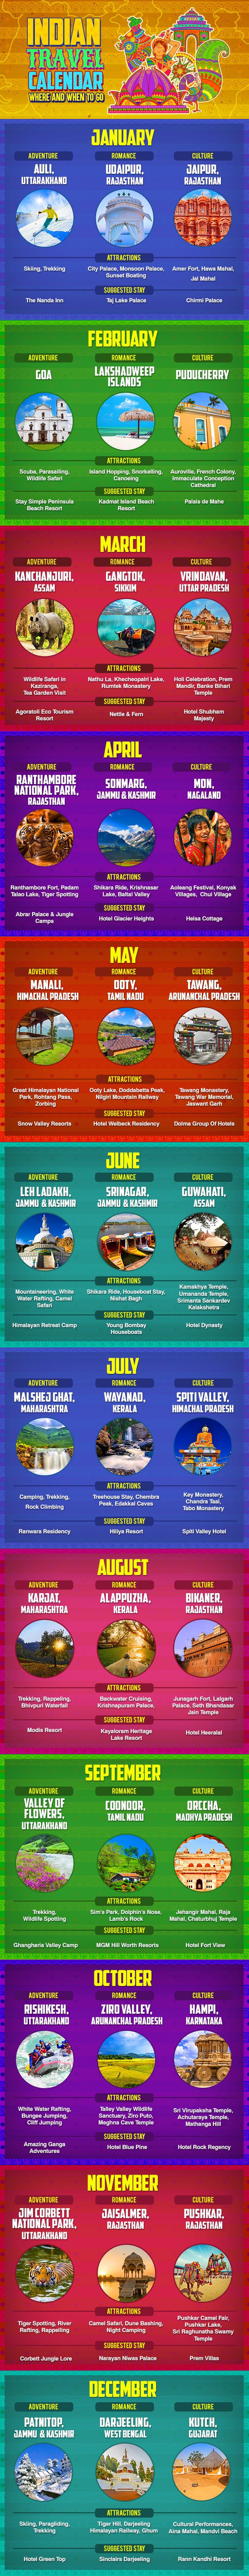 India Travel Calendar Infographic